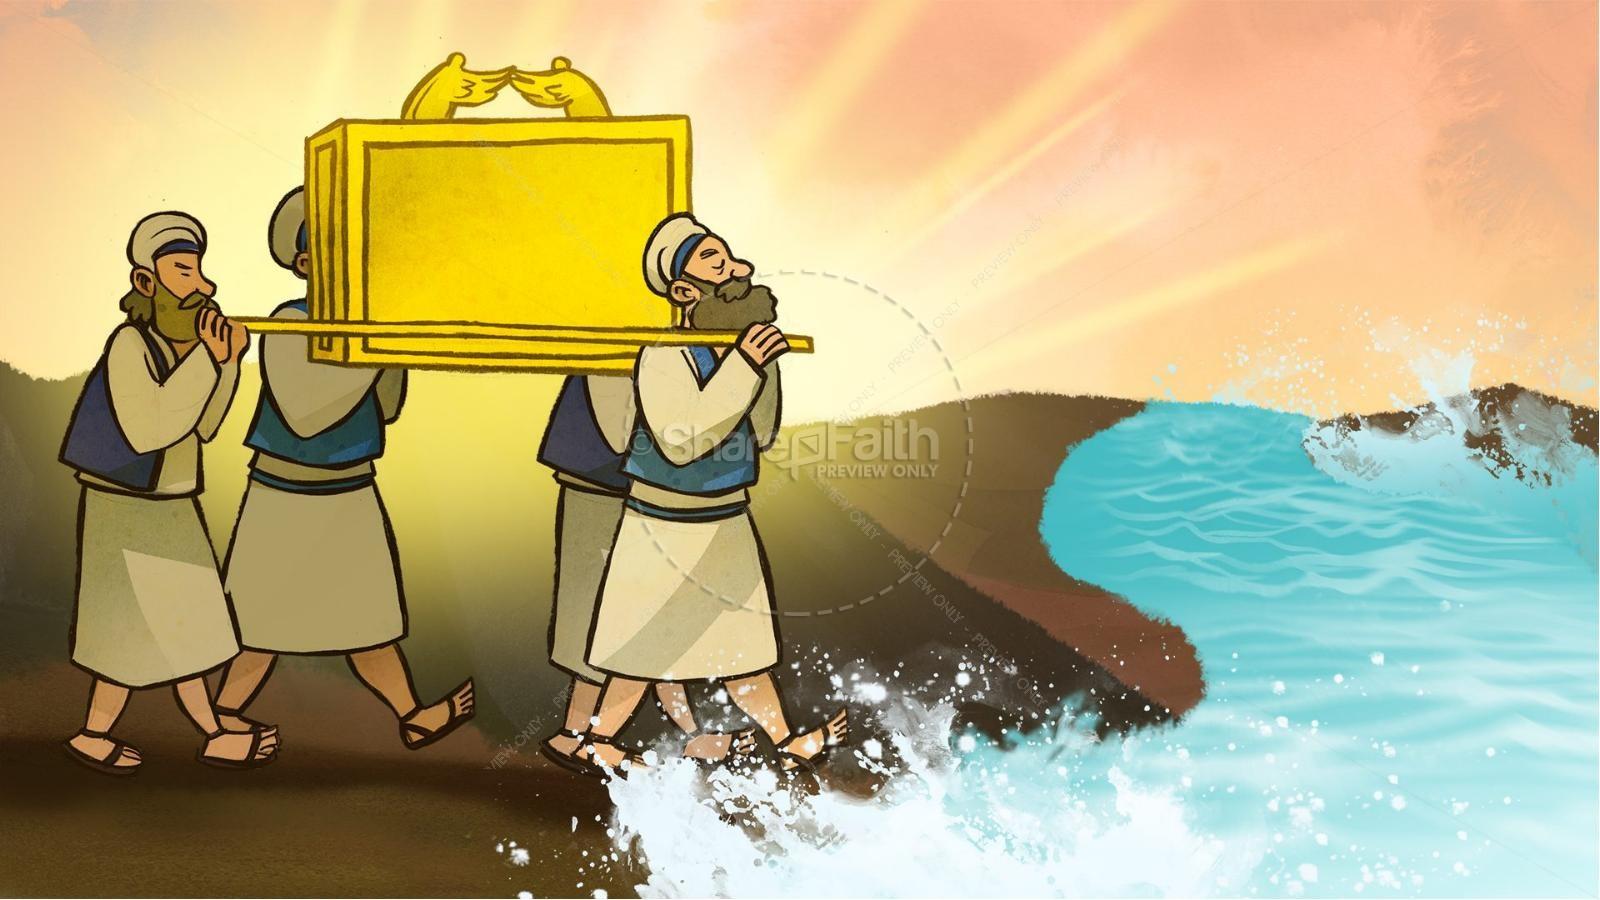 Joshua 3 Crossing The Jordan River Kids Bible Story